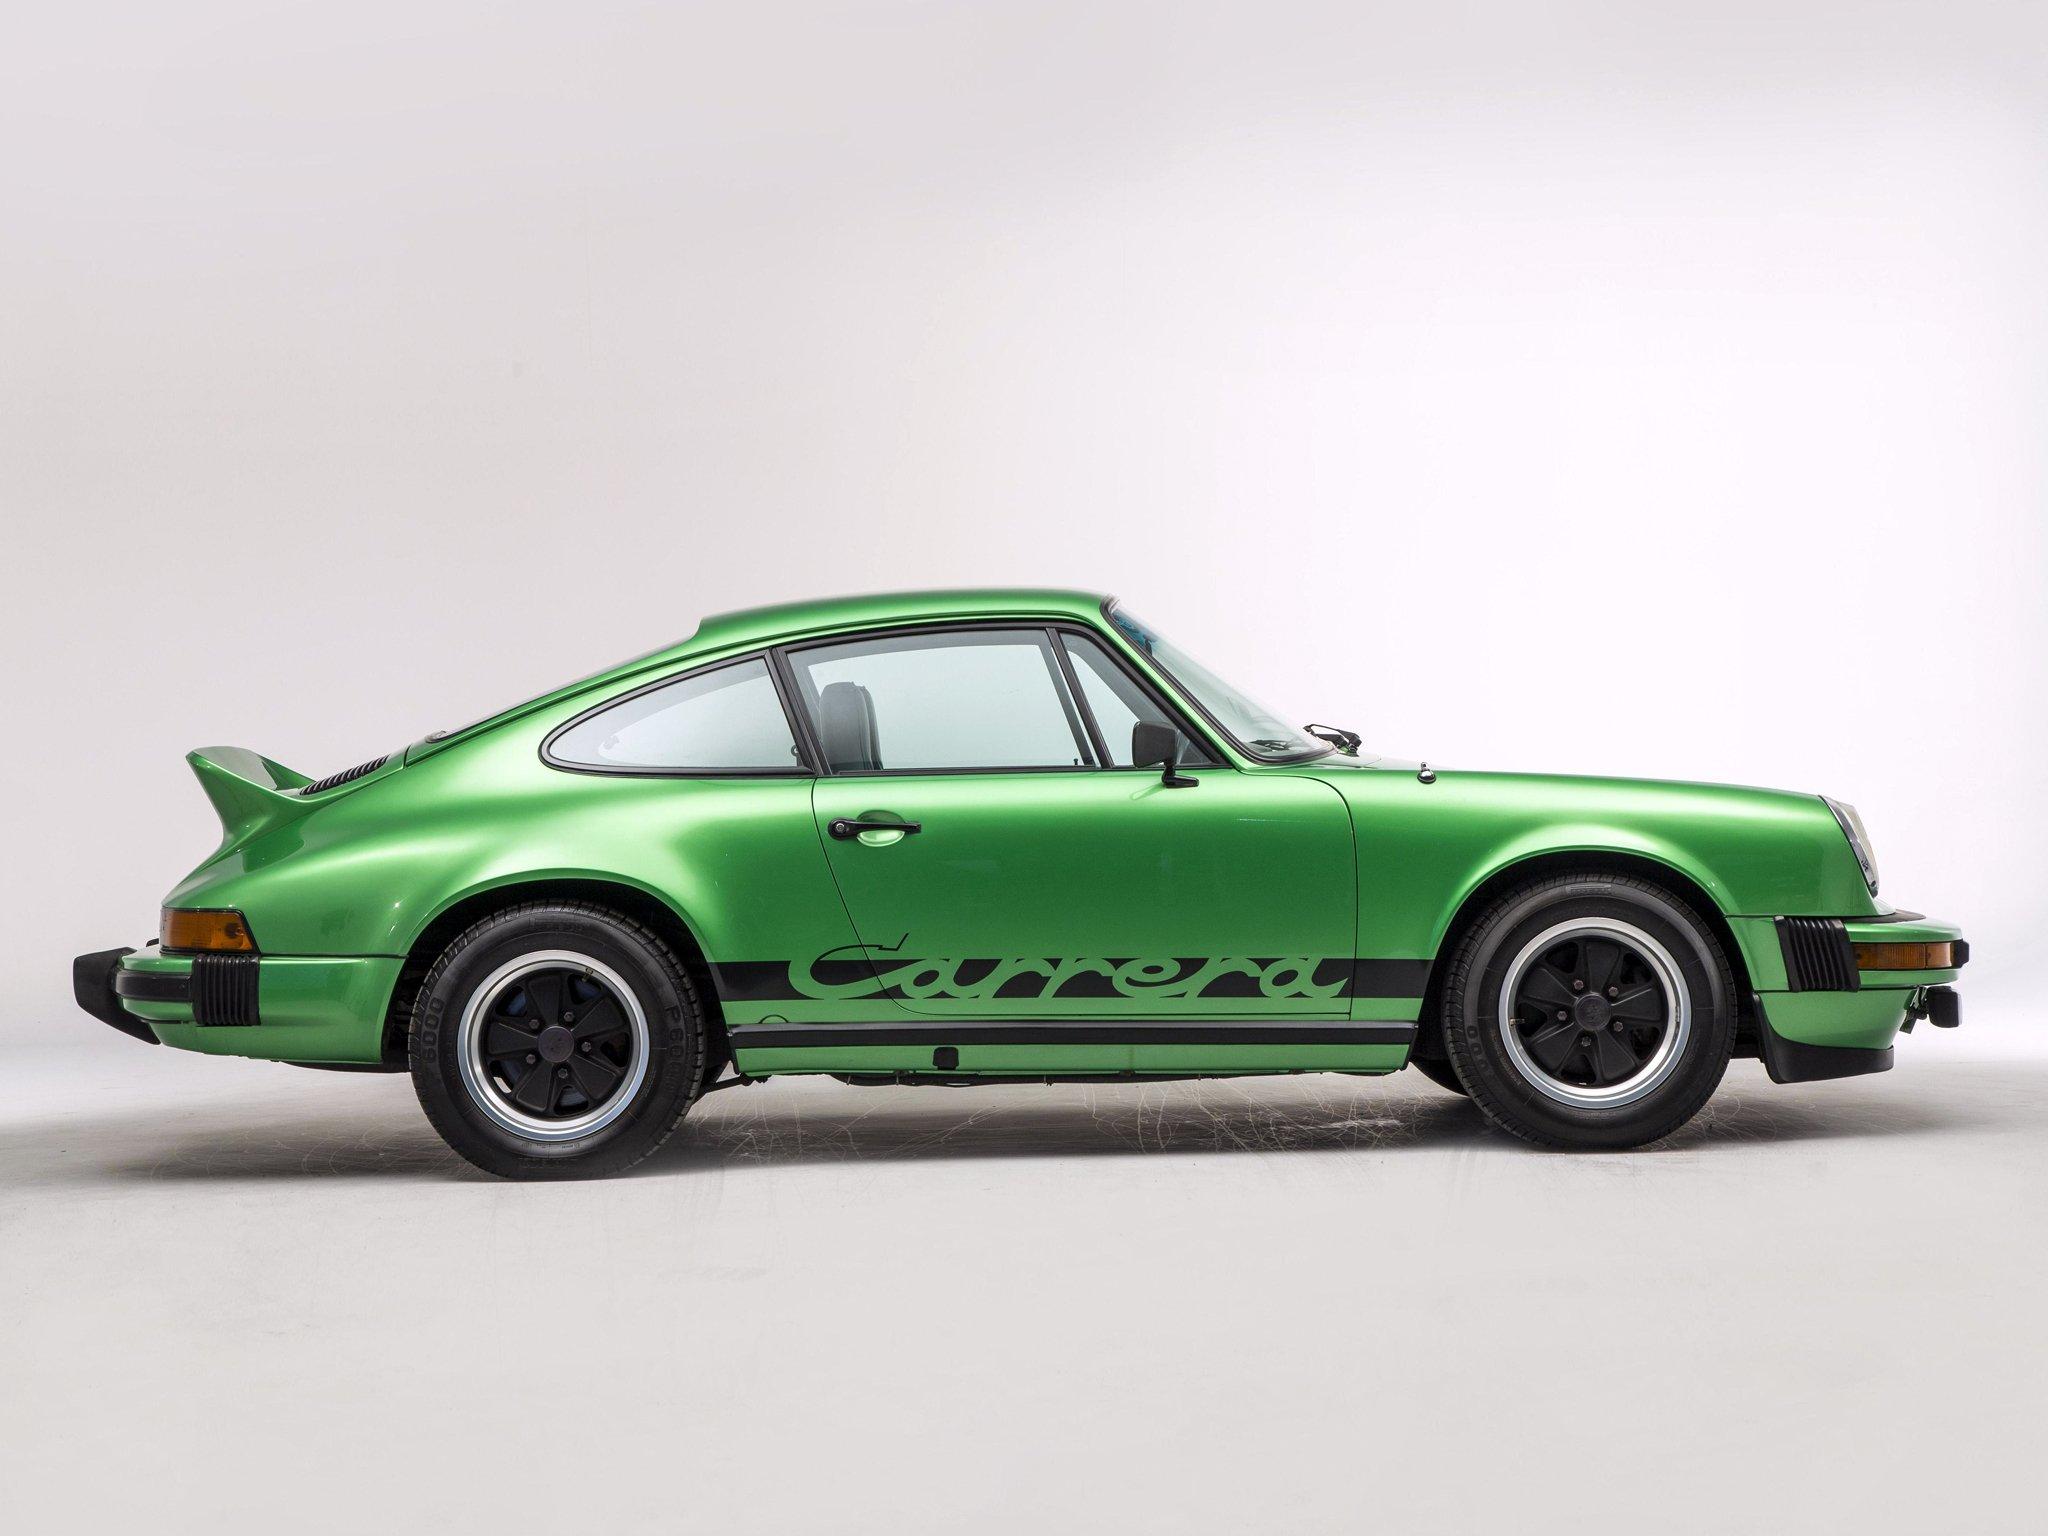 1974 porsche 911 carrera 2 7 coupe 911 classic wallpaper 2048x1536 4351. Black Bedroom Furniture Sets. Home Design Ideas